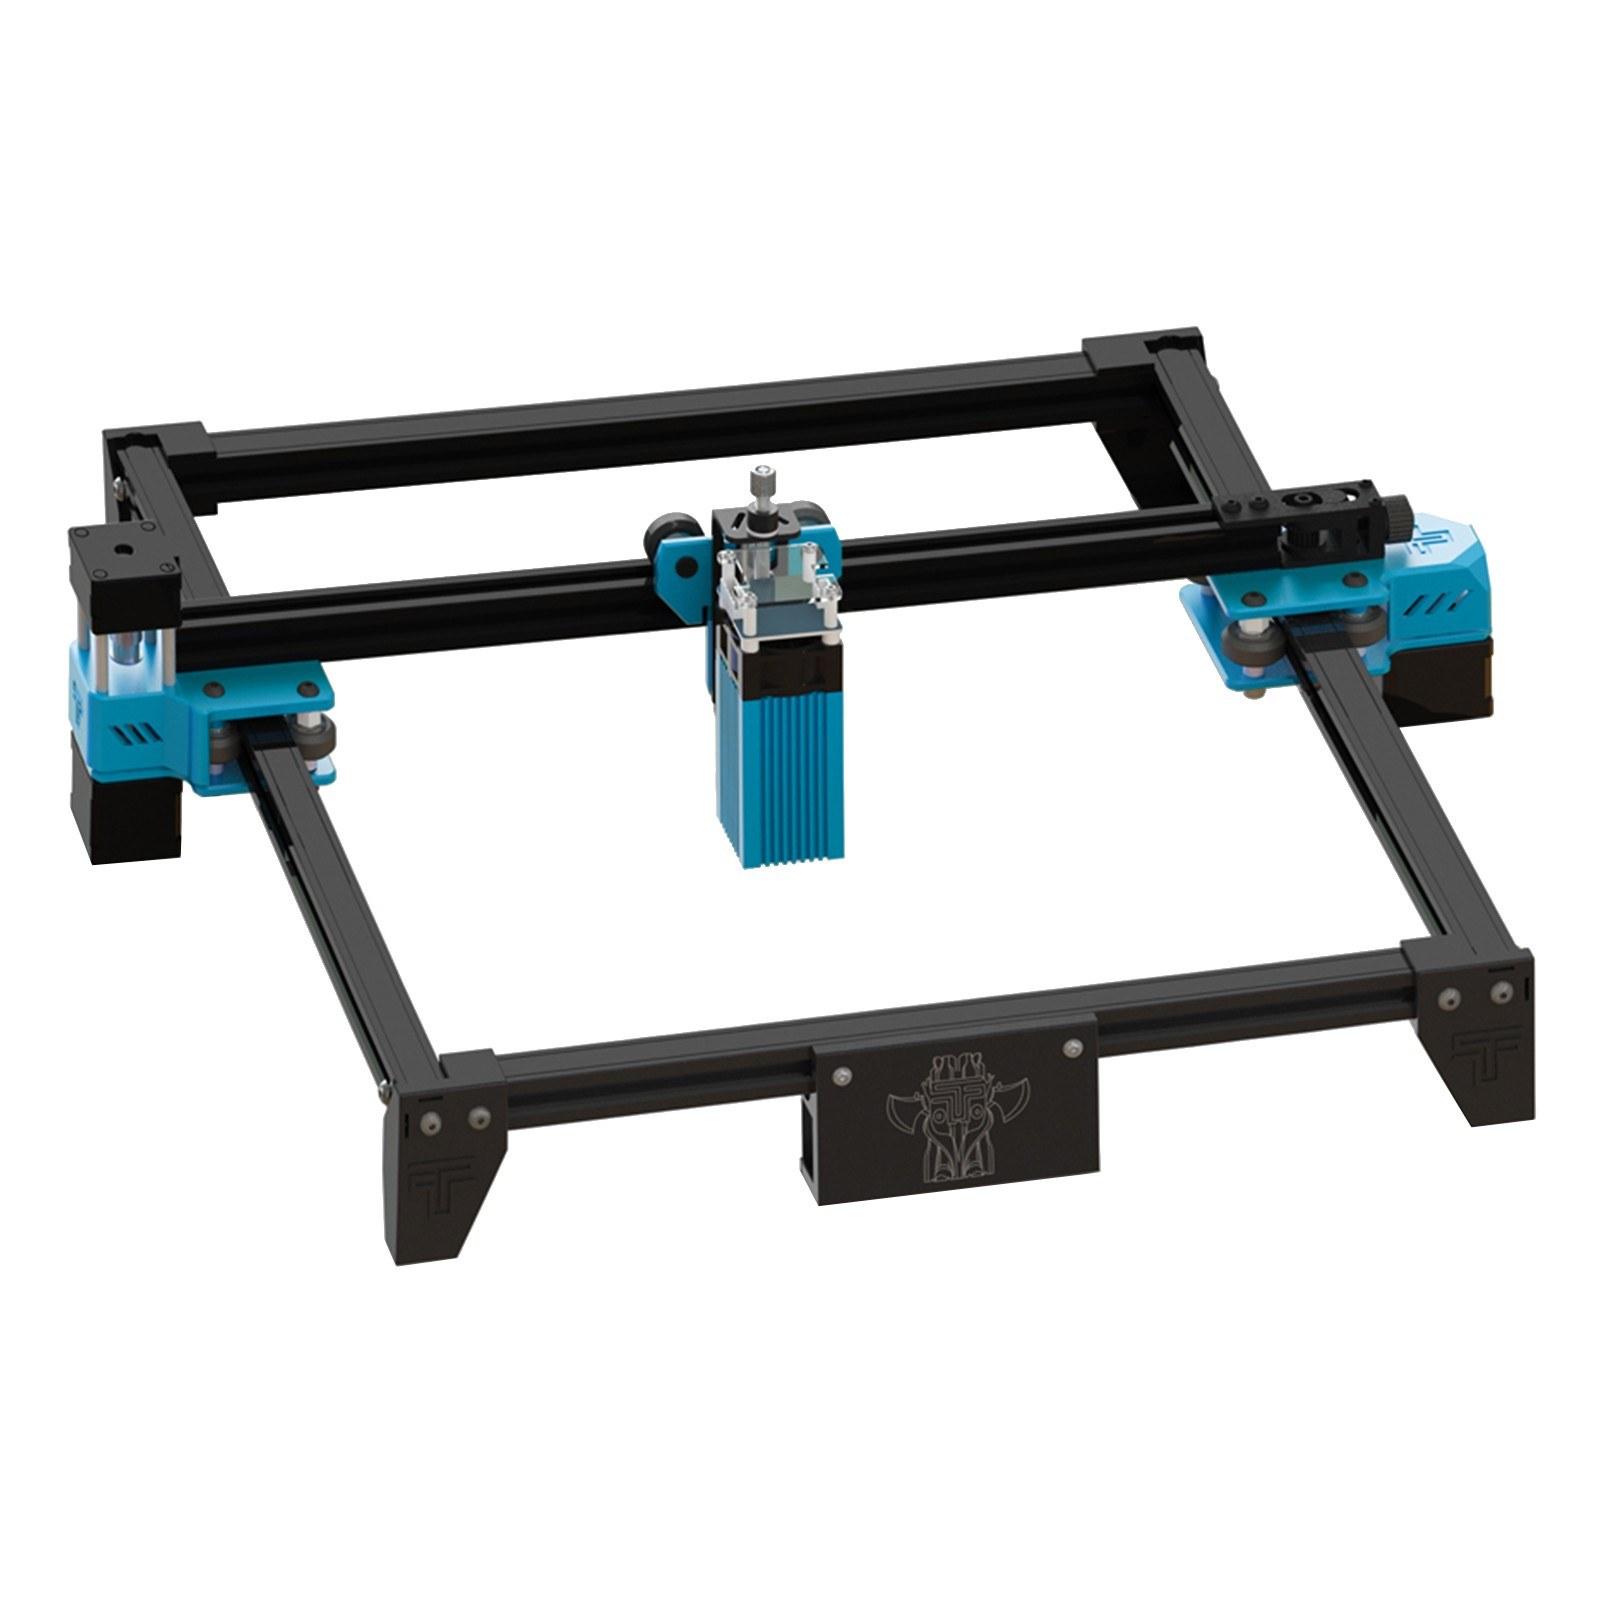 Tomtop - [EU Warehouse] 44% OFF TOTEM S 40W Desktop Laser Engraver High Precision, $282.99 (Inclusive of VAT)